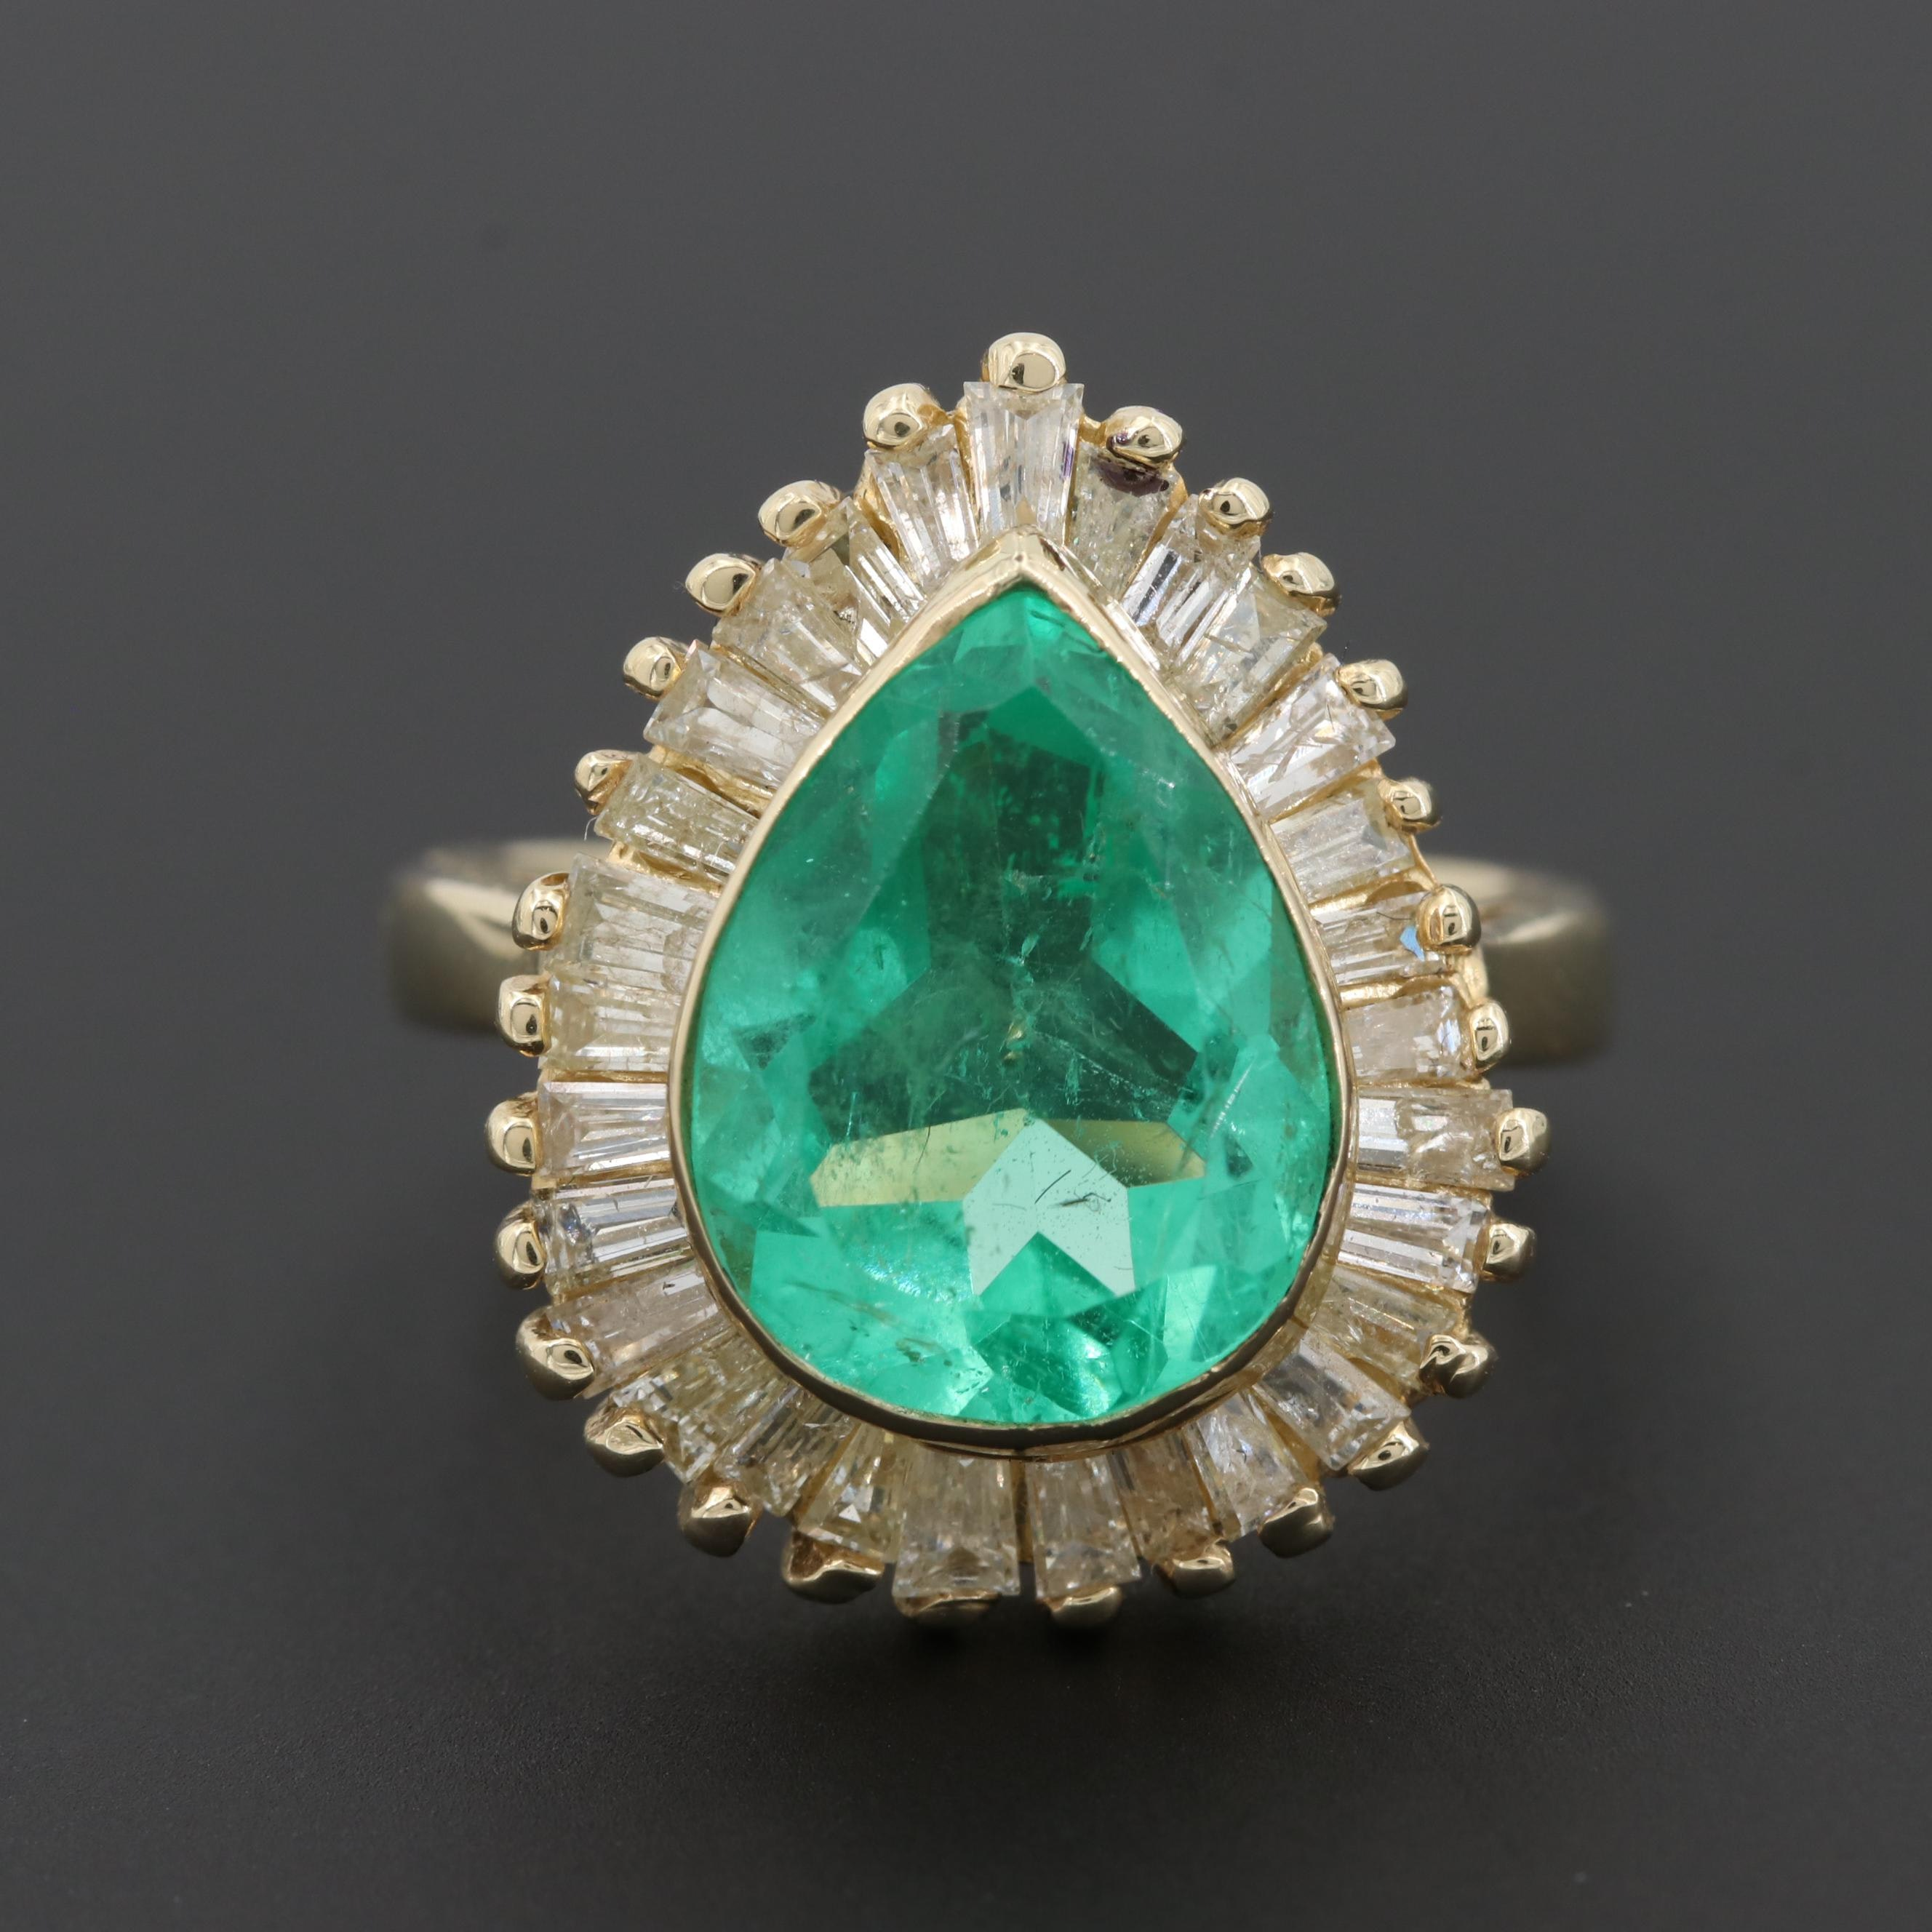 Vintage 14K Yellow Gold 3.59 CT Emerald and 1.07 CTW Diamond Ballerina Ring